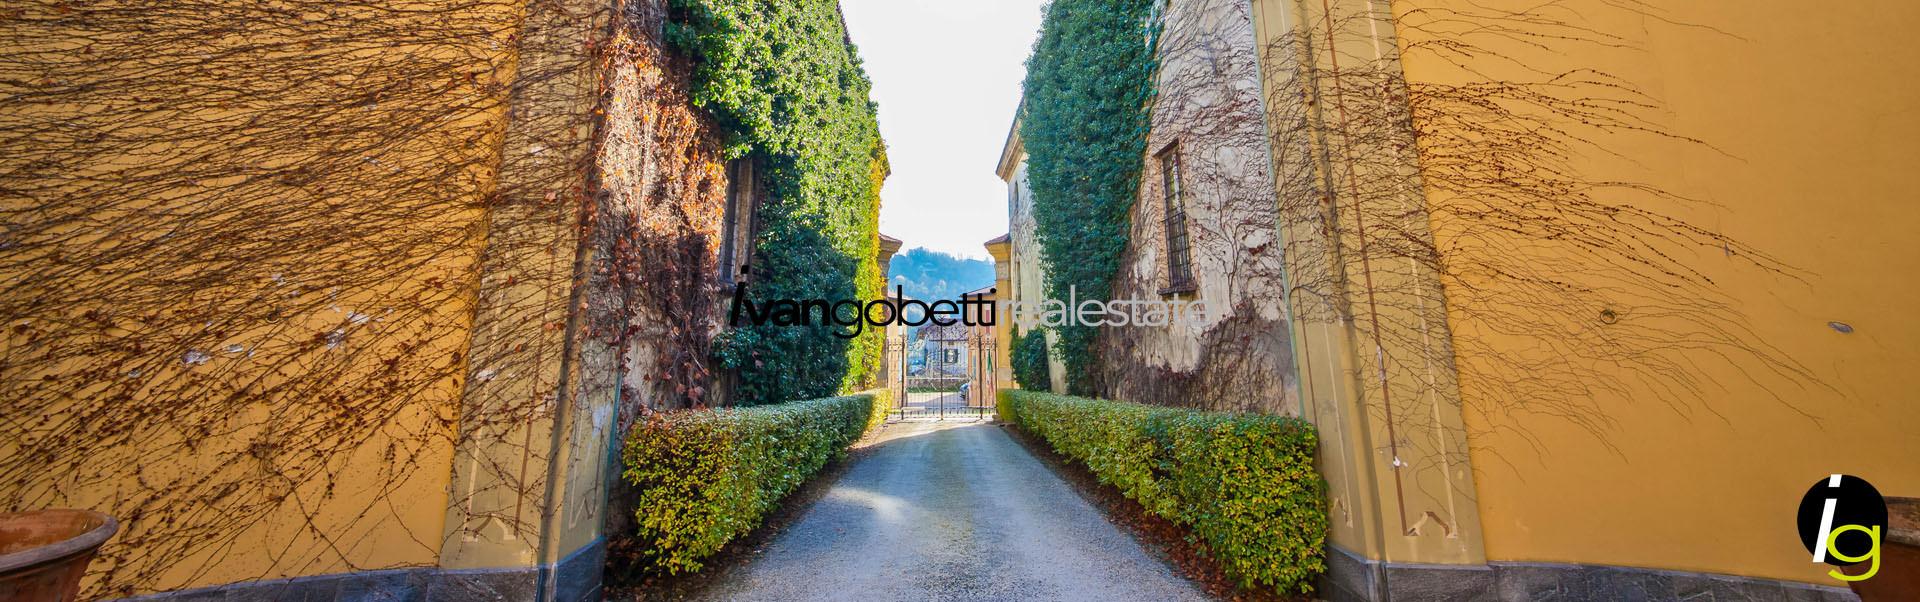 Italia Lago di Varese, vendesi Castello